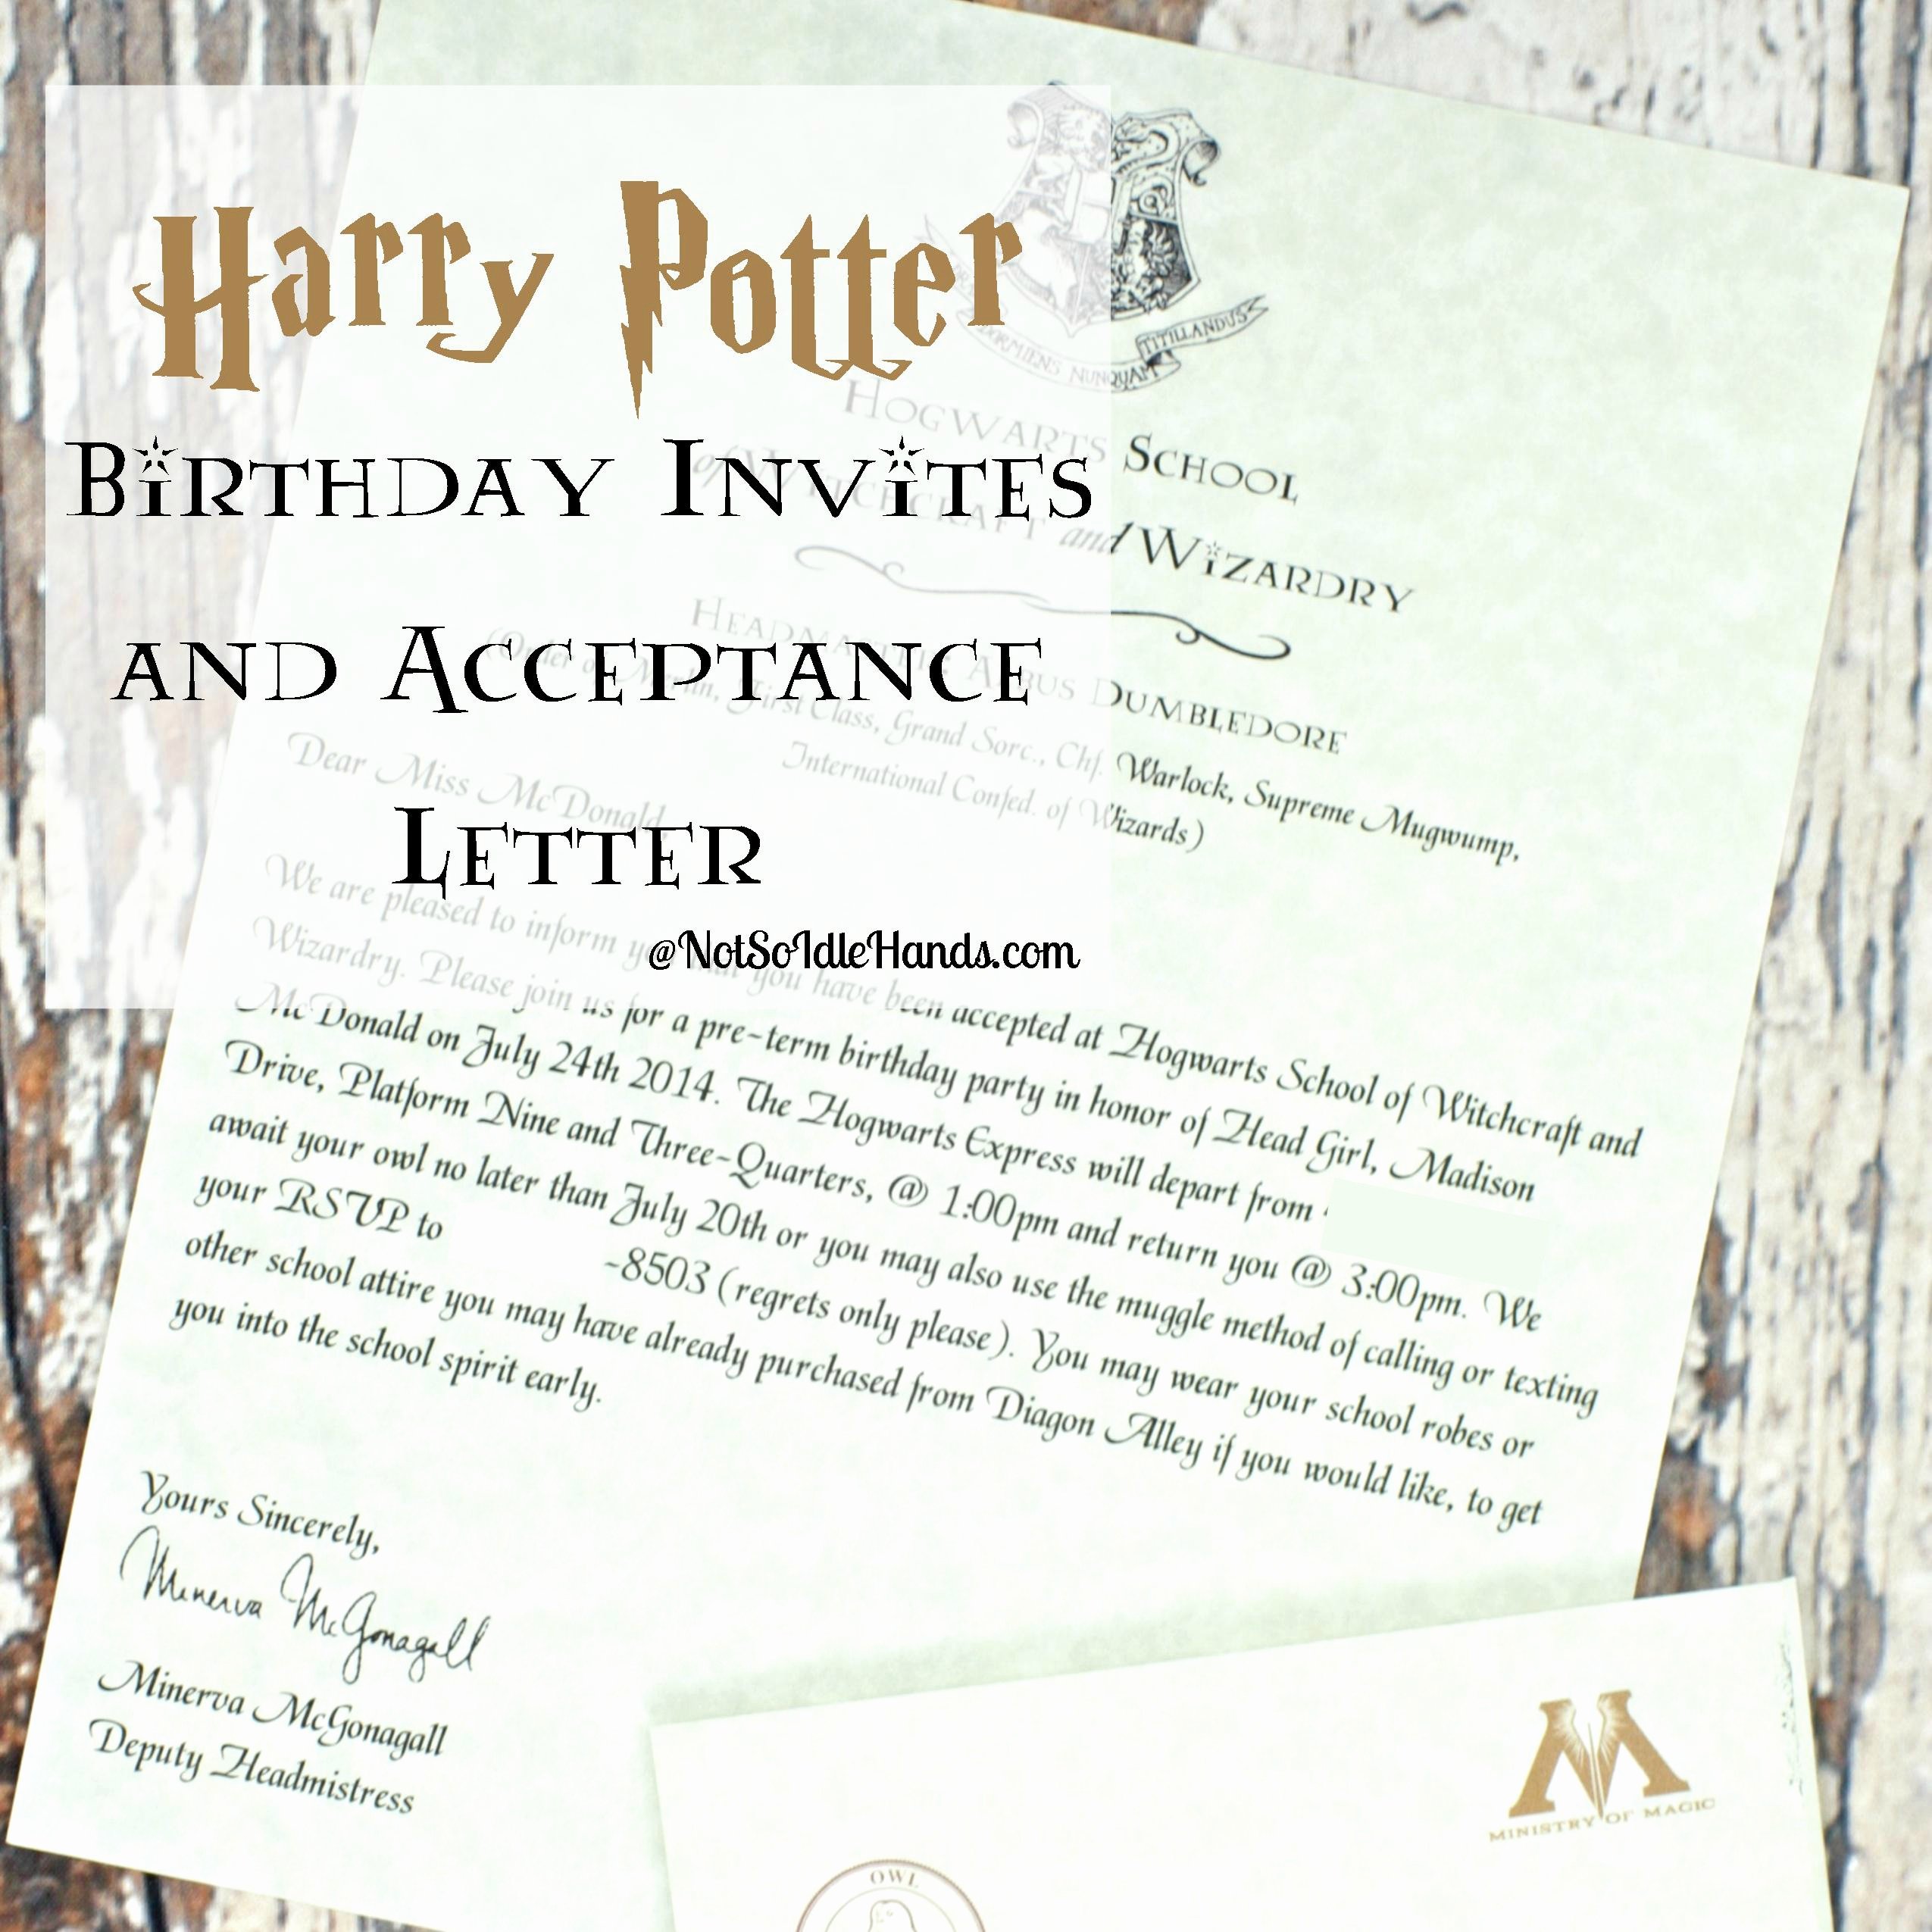 Harry Potter Birthday Party Invitation Lovely Harry Potter Birthday Invitations and Authentic Acceptance